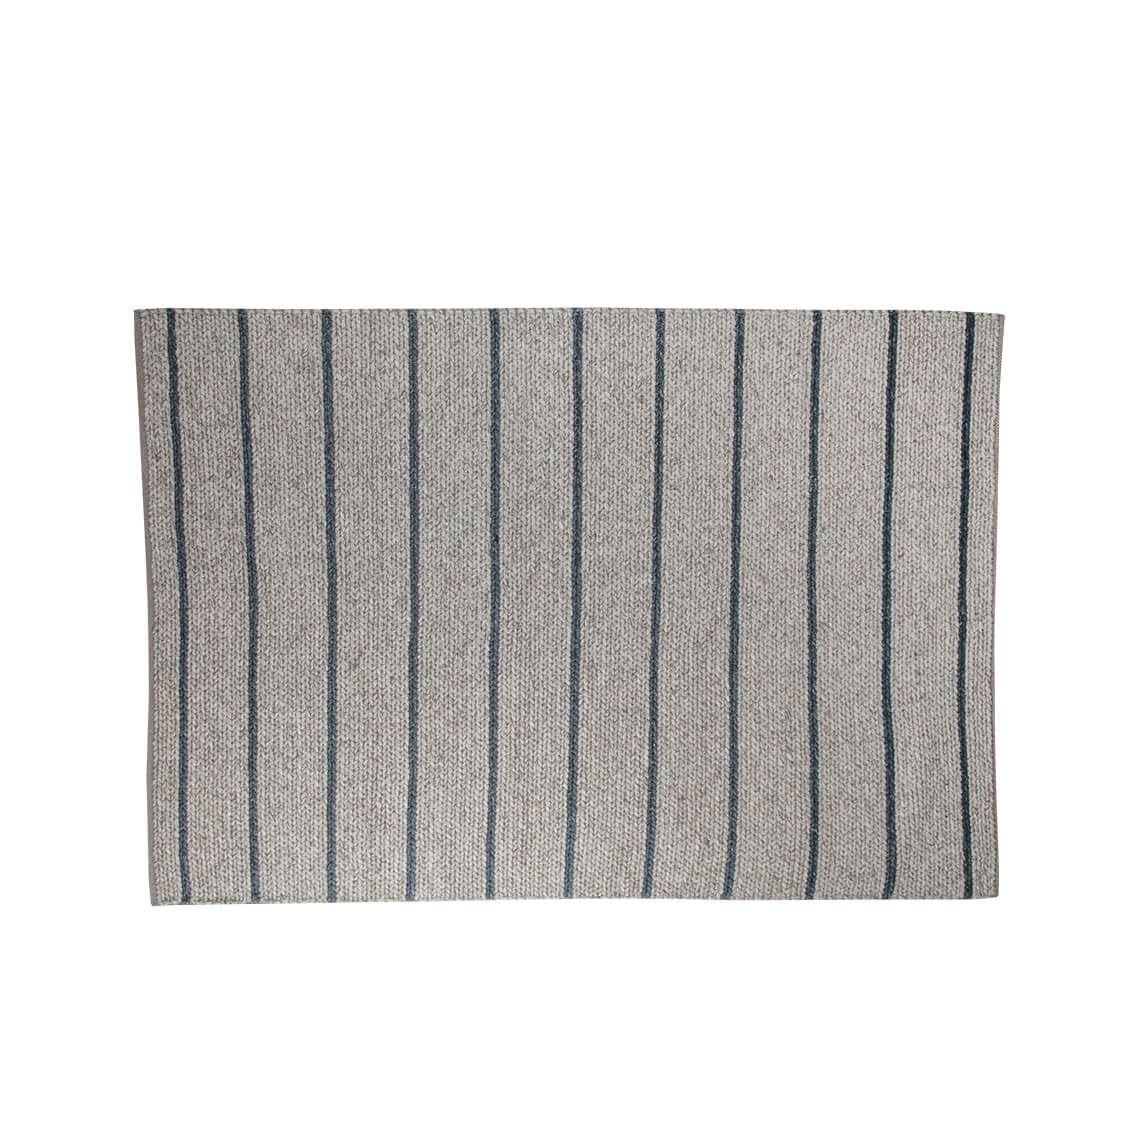 Romain Stripe Floor Rug 160 X 230Cm Beige & Blue Pertaining To Romain Accent Mirrors (Photo 28 of 30)